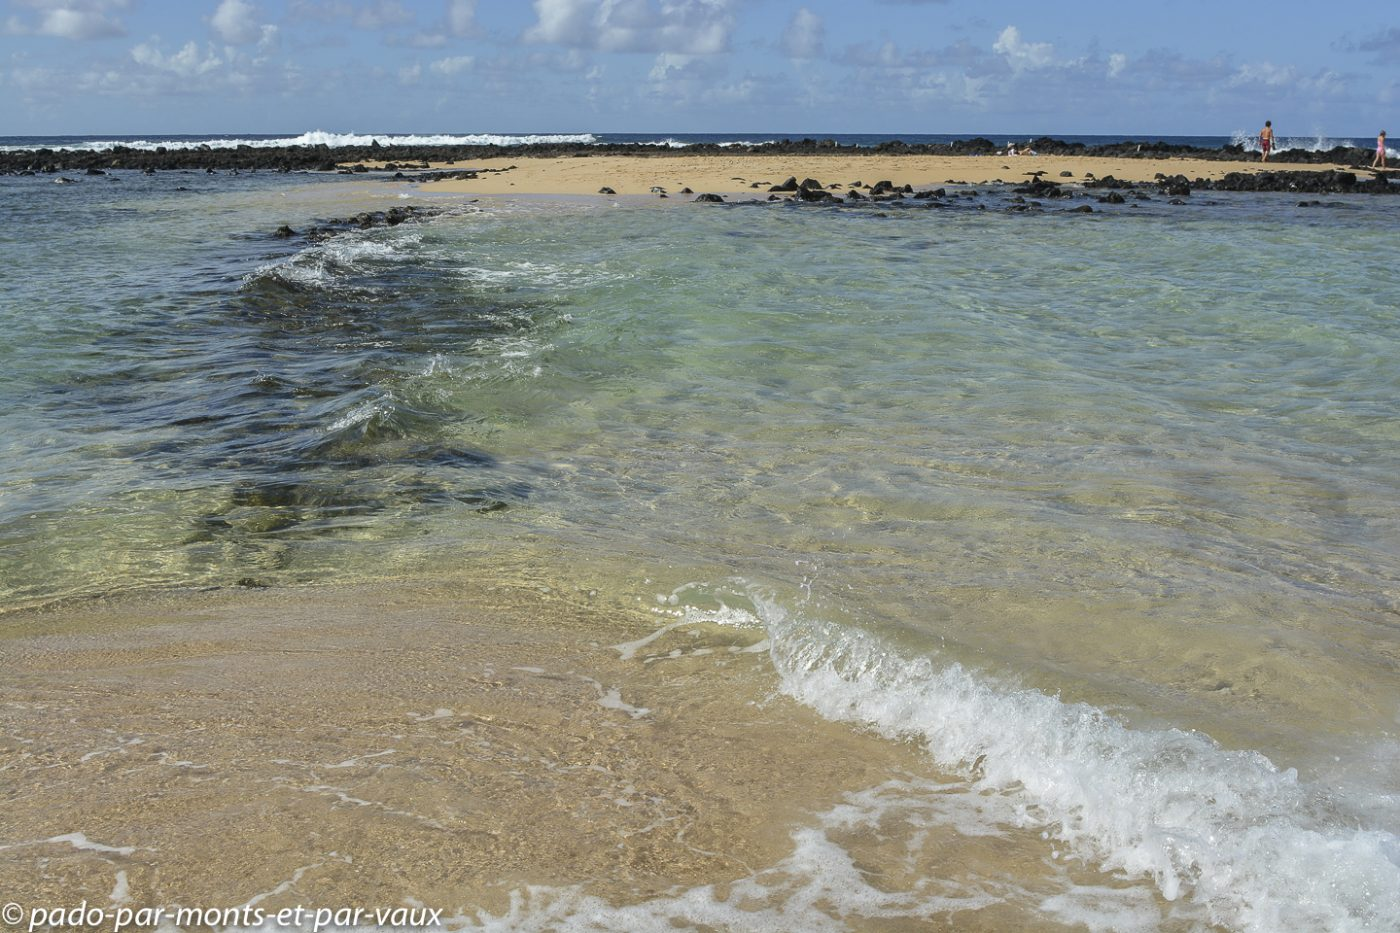 Kauai - Poipu beach park